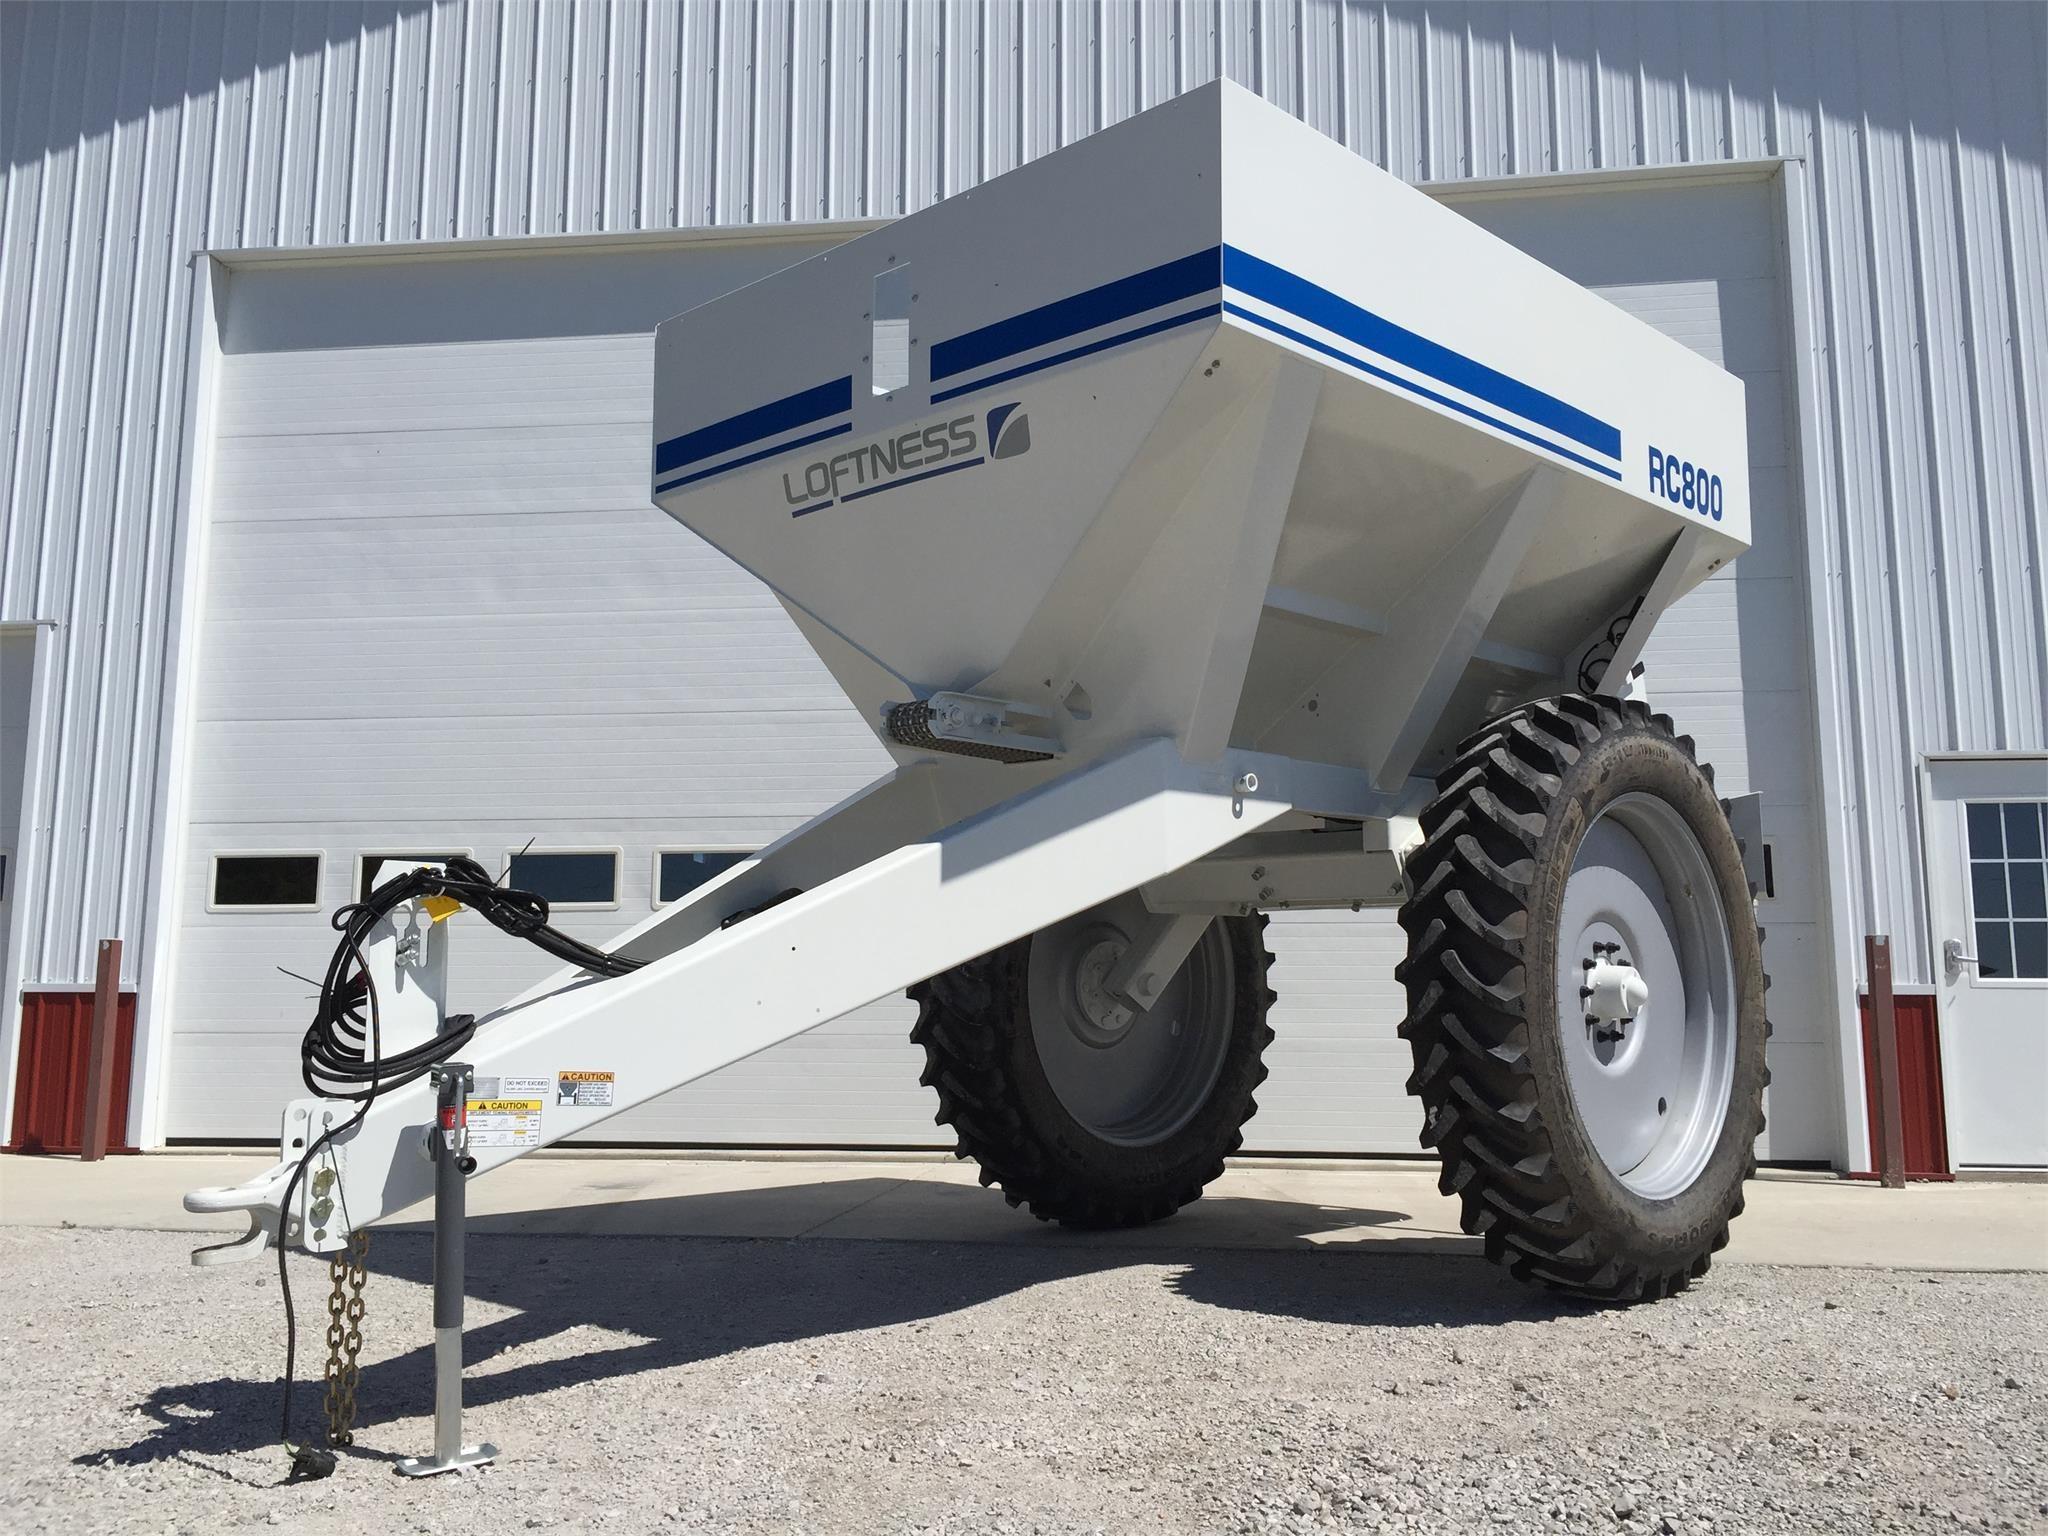 2019 Loftness RC800 Pull-Type Fertilizer Spreader